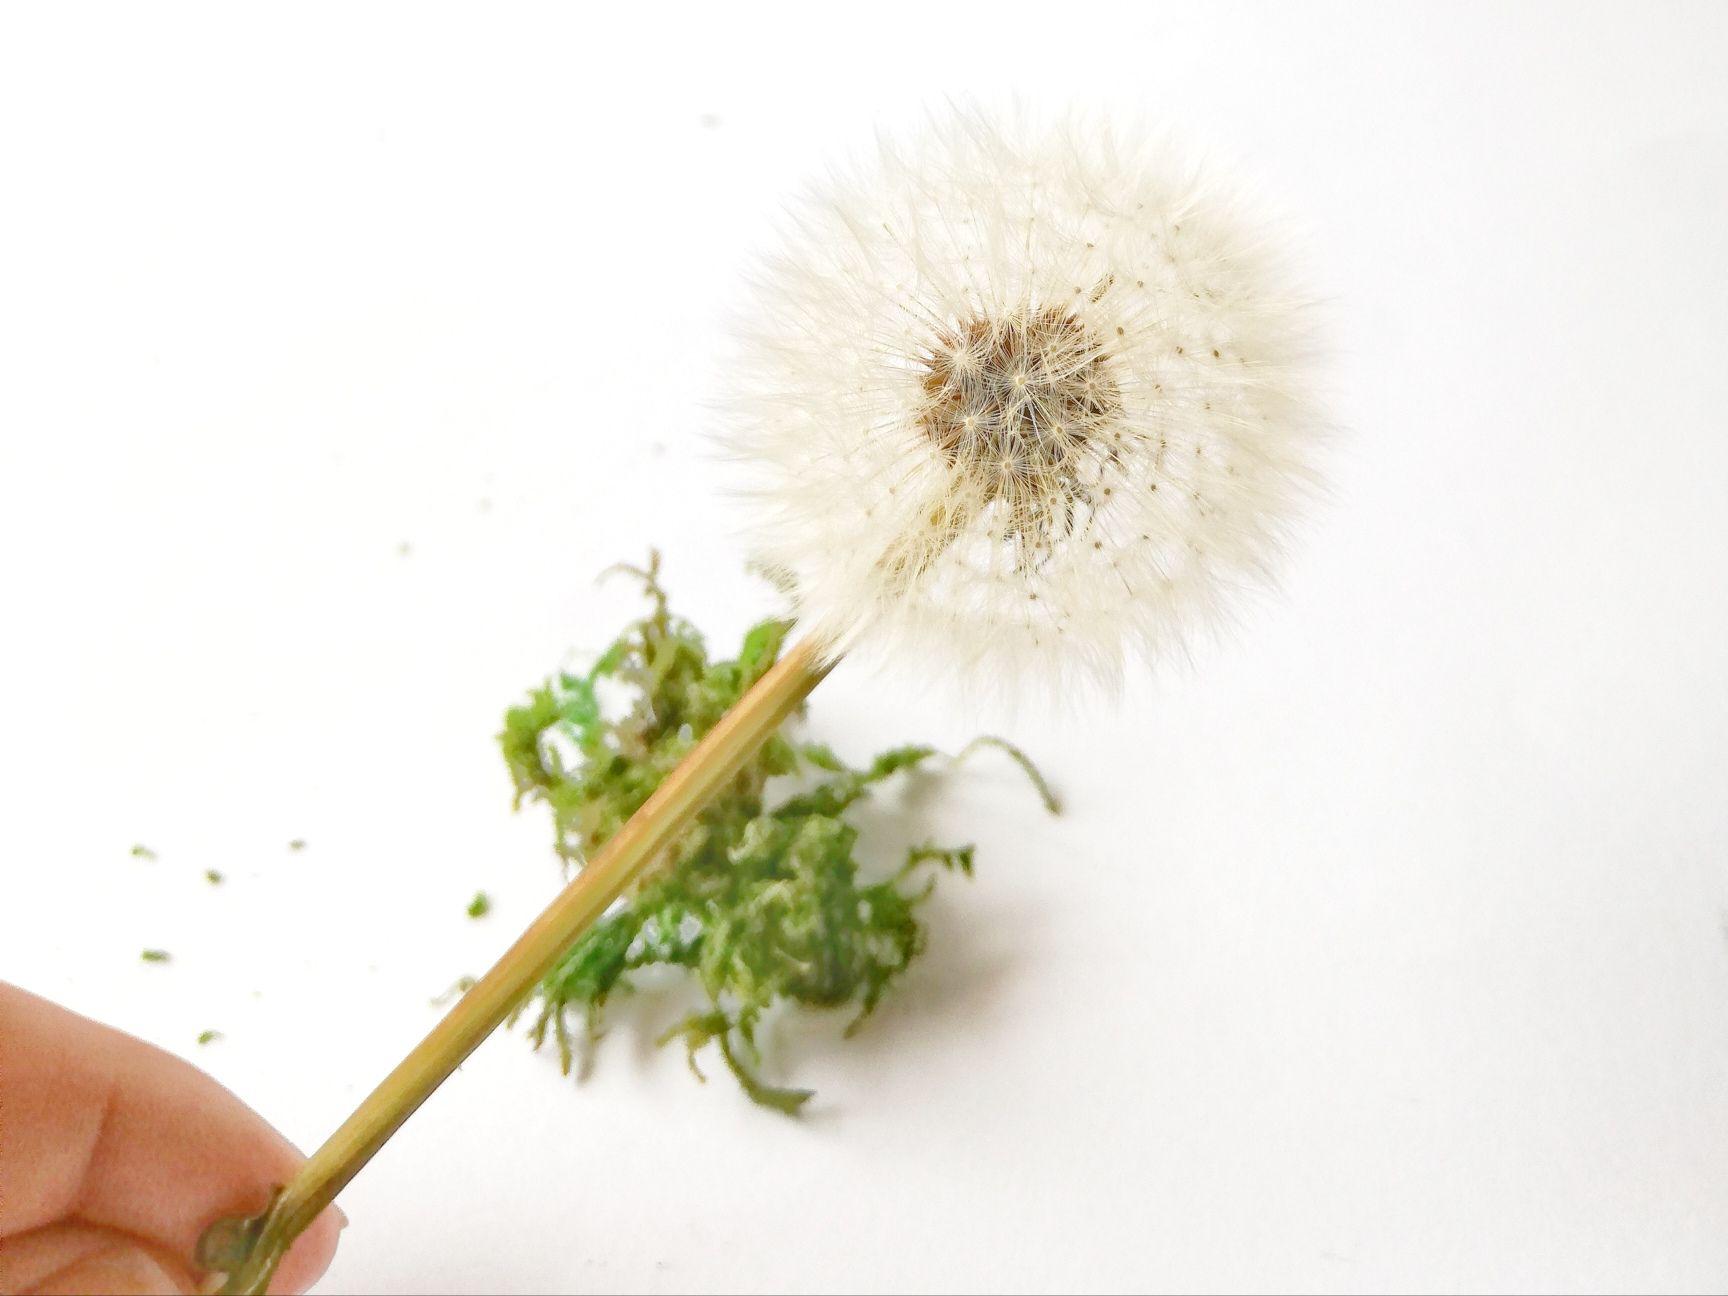 Deko-Trend: Pusteblumen haltbar machen - dorfmama.de